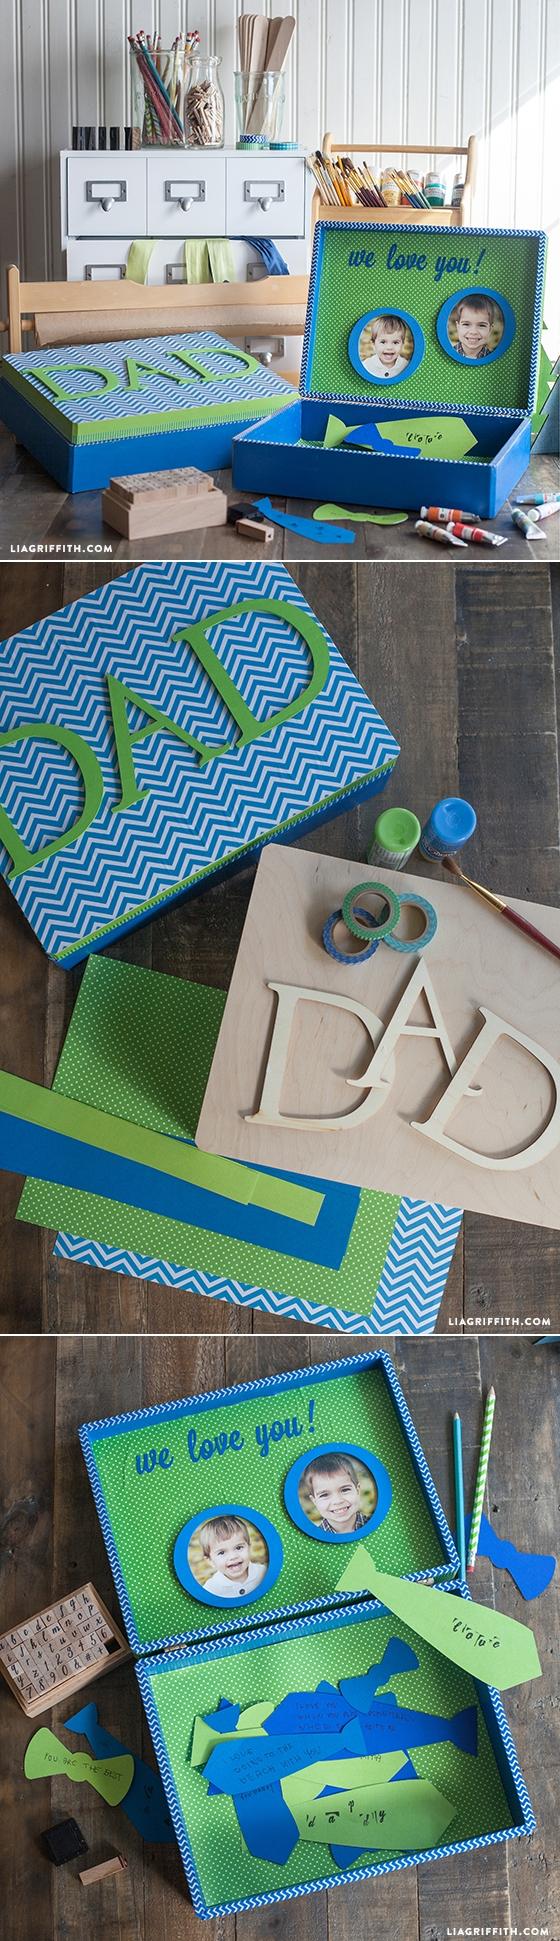 DIY Father's Day Treasure Box | Cricut Ideas from Bloggers